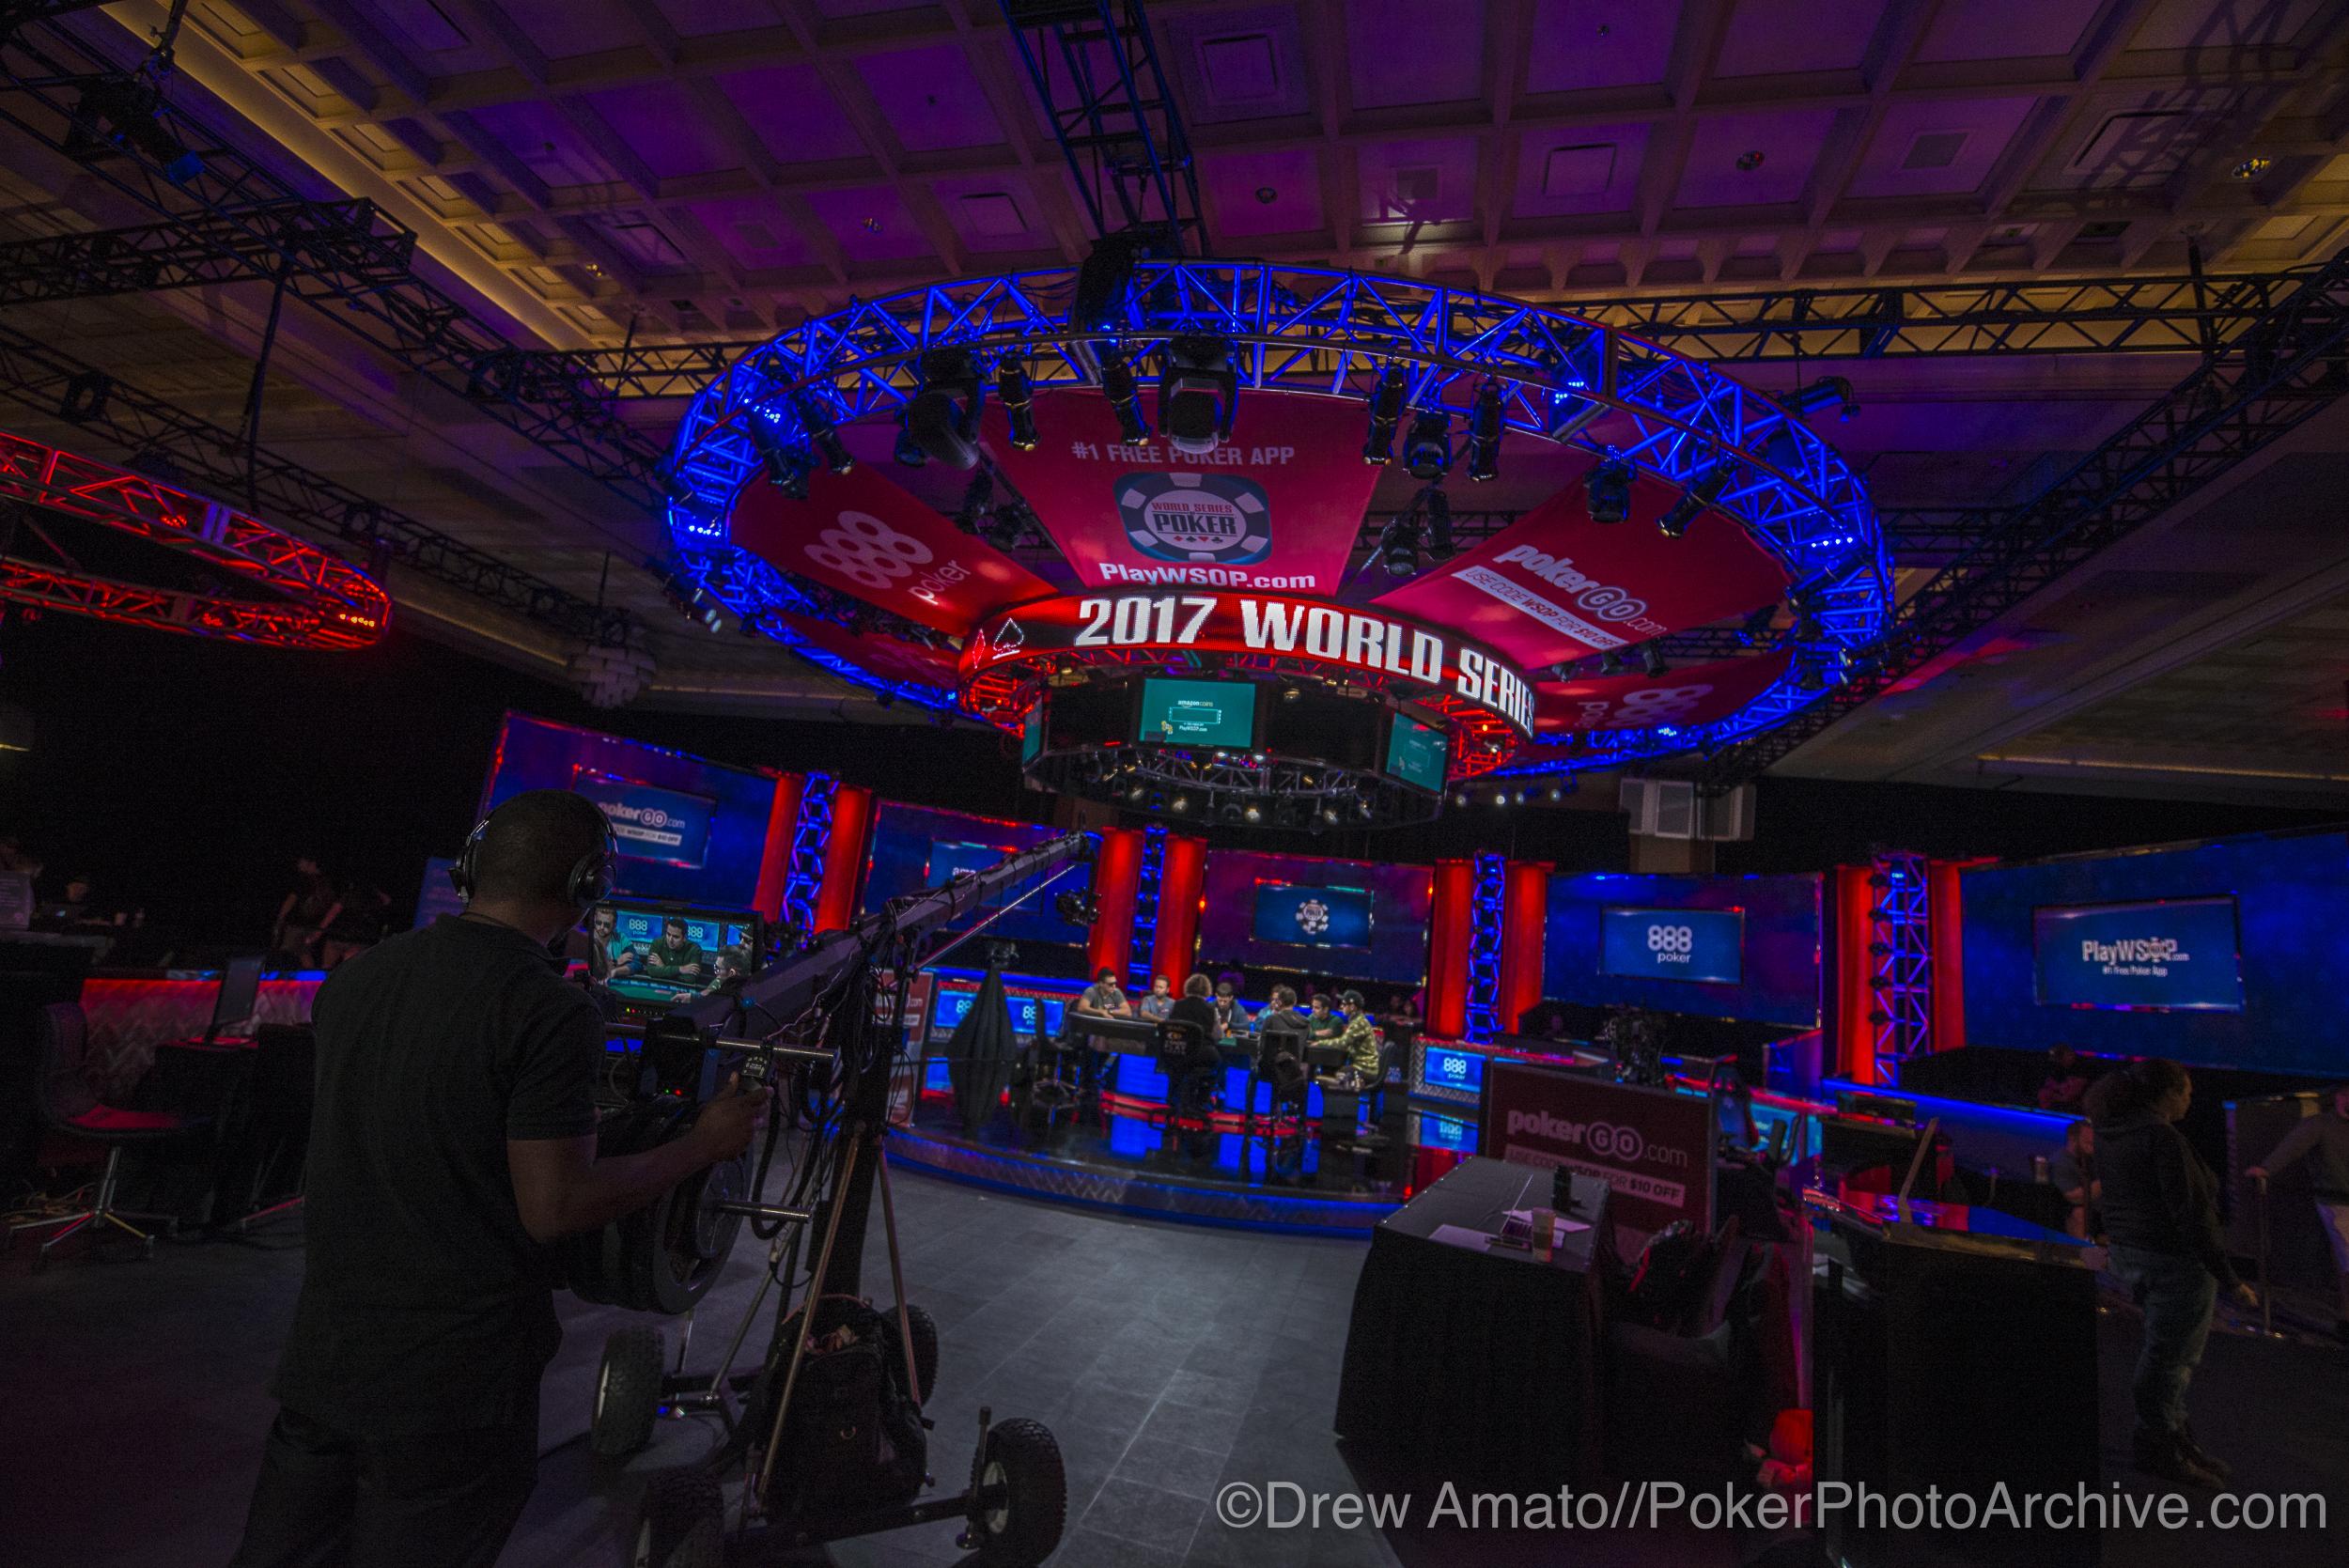 Main Stage_2017 WSOP_EV010_Day 3_Amato_DA66287.jpg